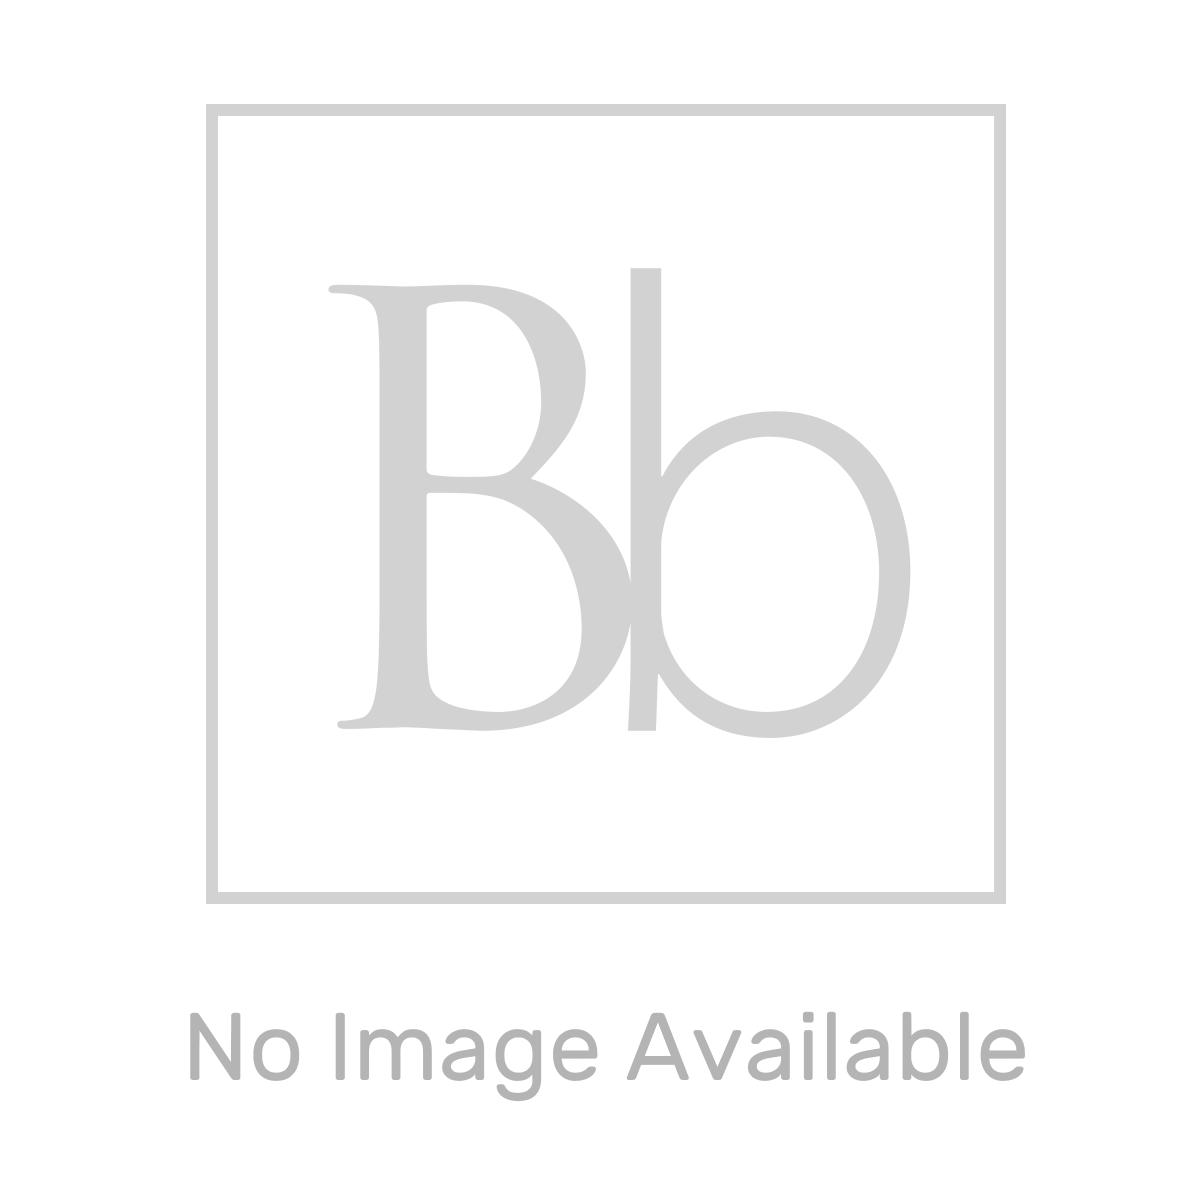 Aquadart Rectangular 1100 x 760 Shower Tray Line Drawing